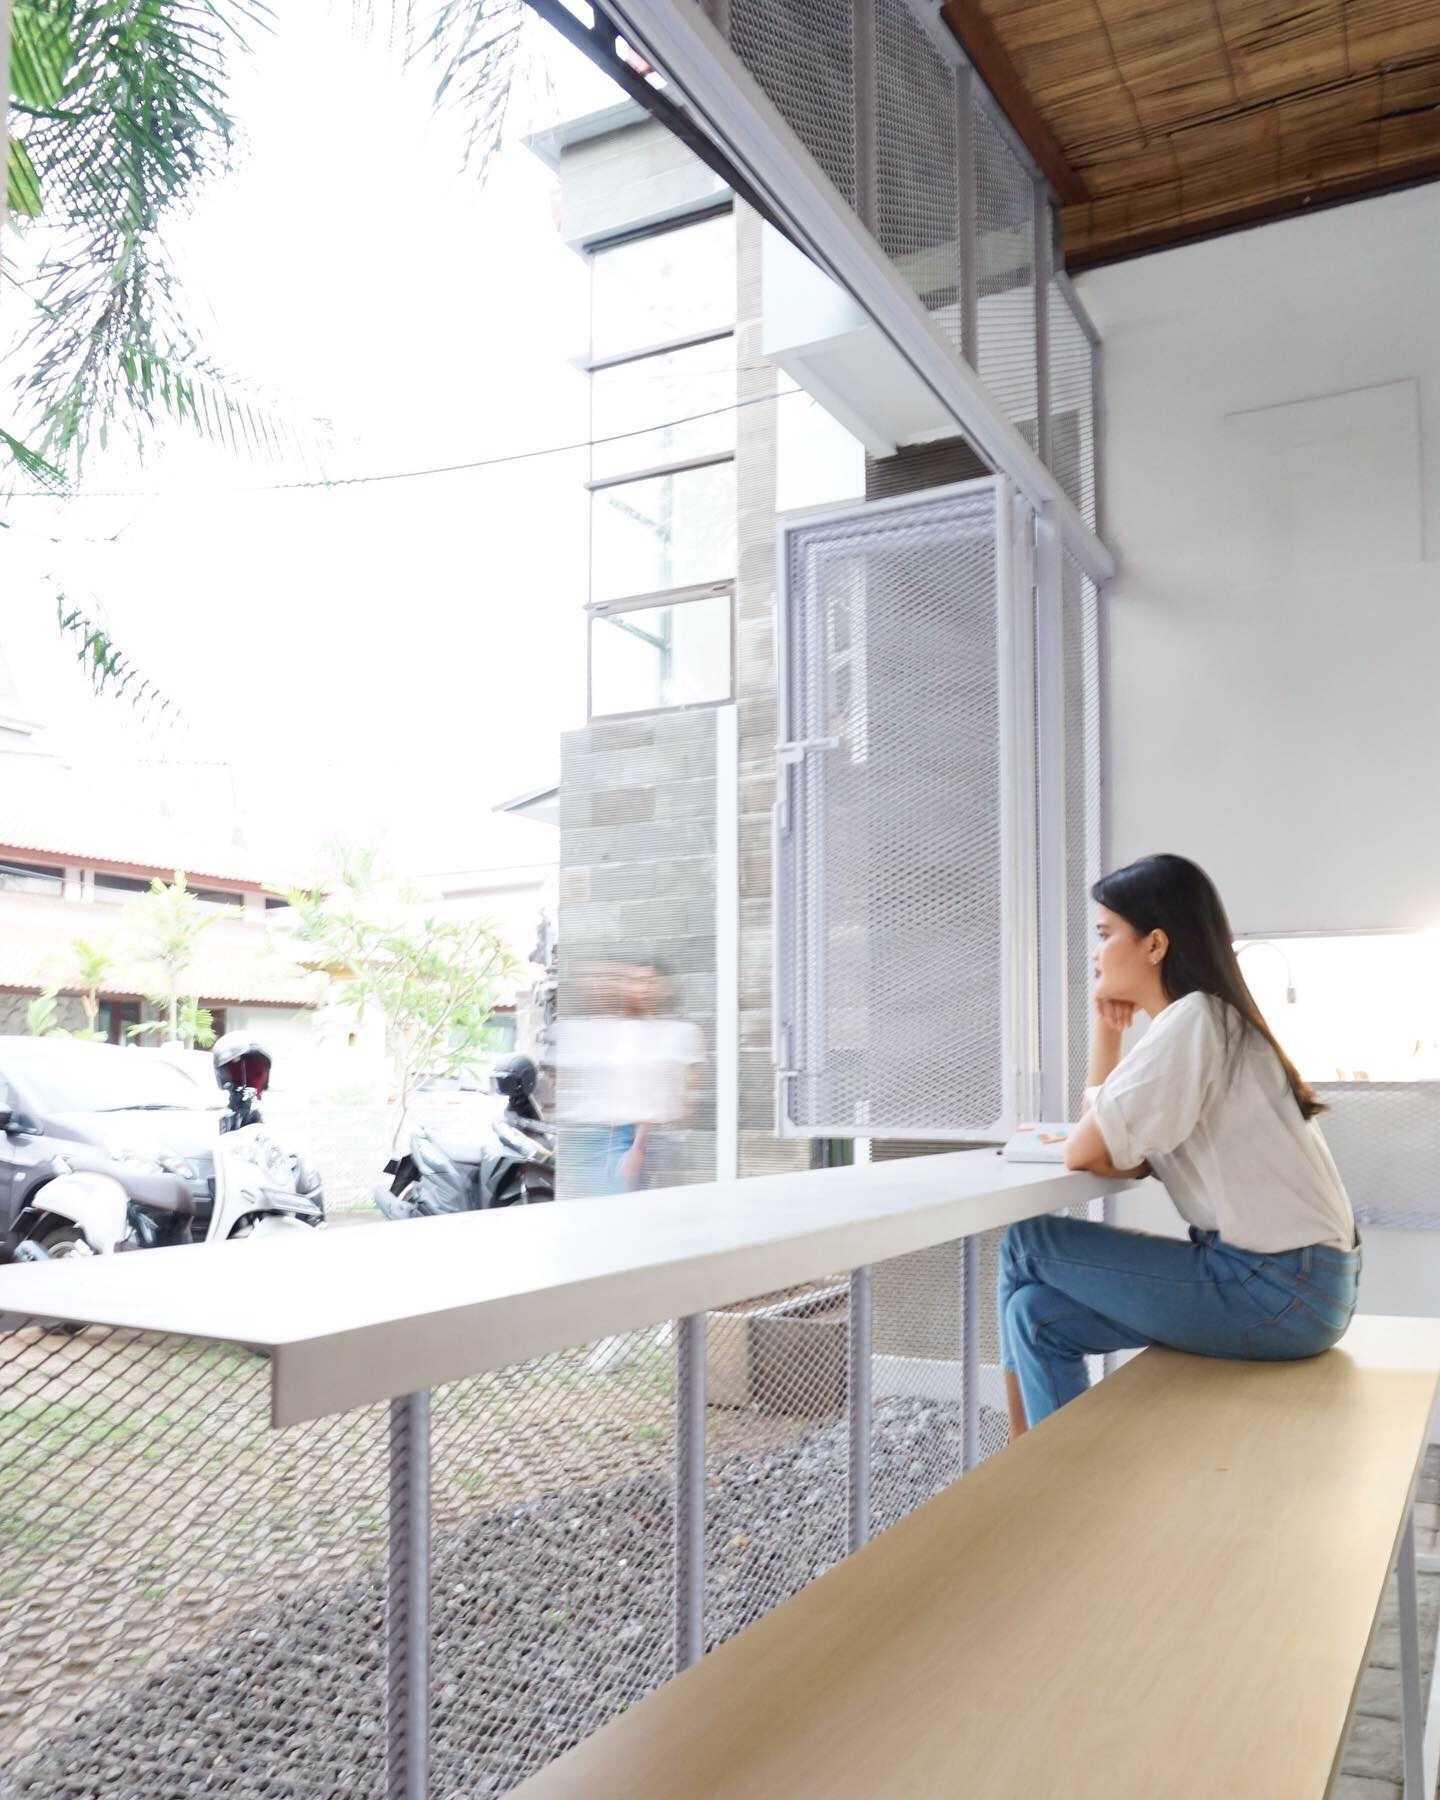 Sume Interior Nt Office Kota Denpasar, Bali, Indonesia Kota Denpasar, Bali, Indonesia Sume-Interior-Nt-Office  85538